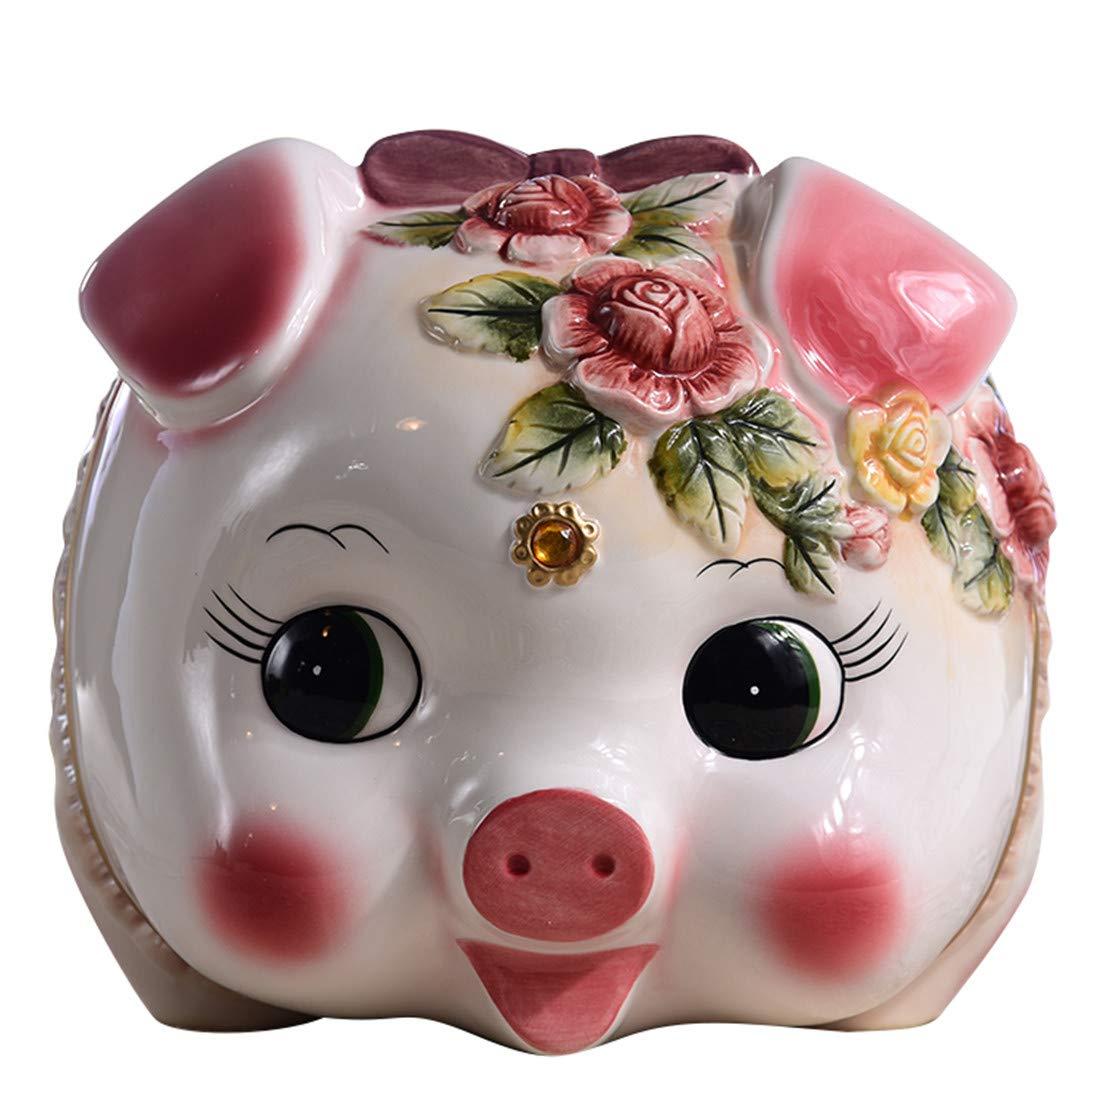 FORLONG FL2032 Ceramic Piggy Bank,Coin Bank,Money Box for Girls,Hand Painted Flower Pig Design (Large ) by FORLONG